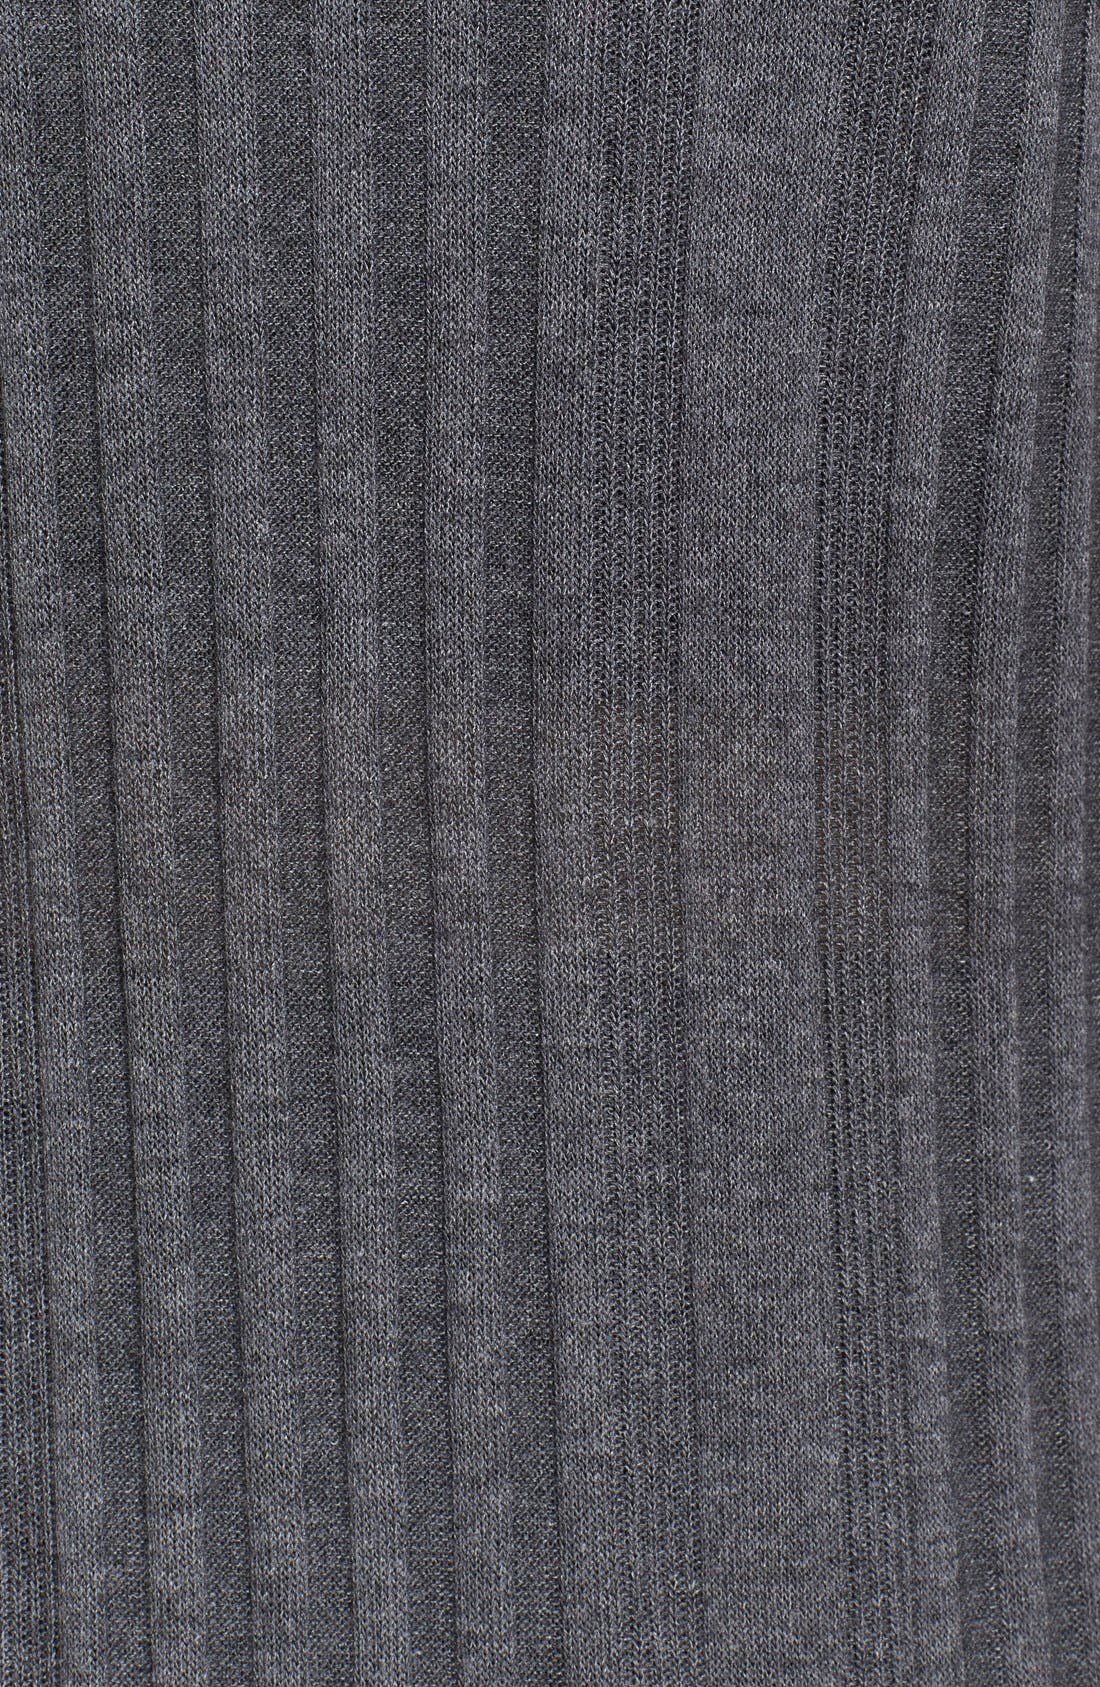 'Espresso' Long Turtleneck Sweater,                             Alternate thumbnail 2, color,                             035